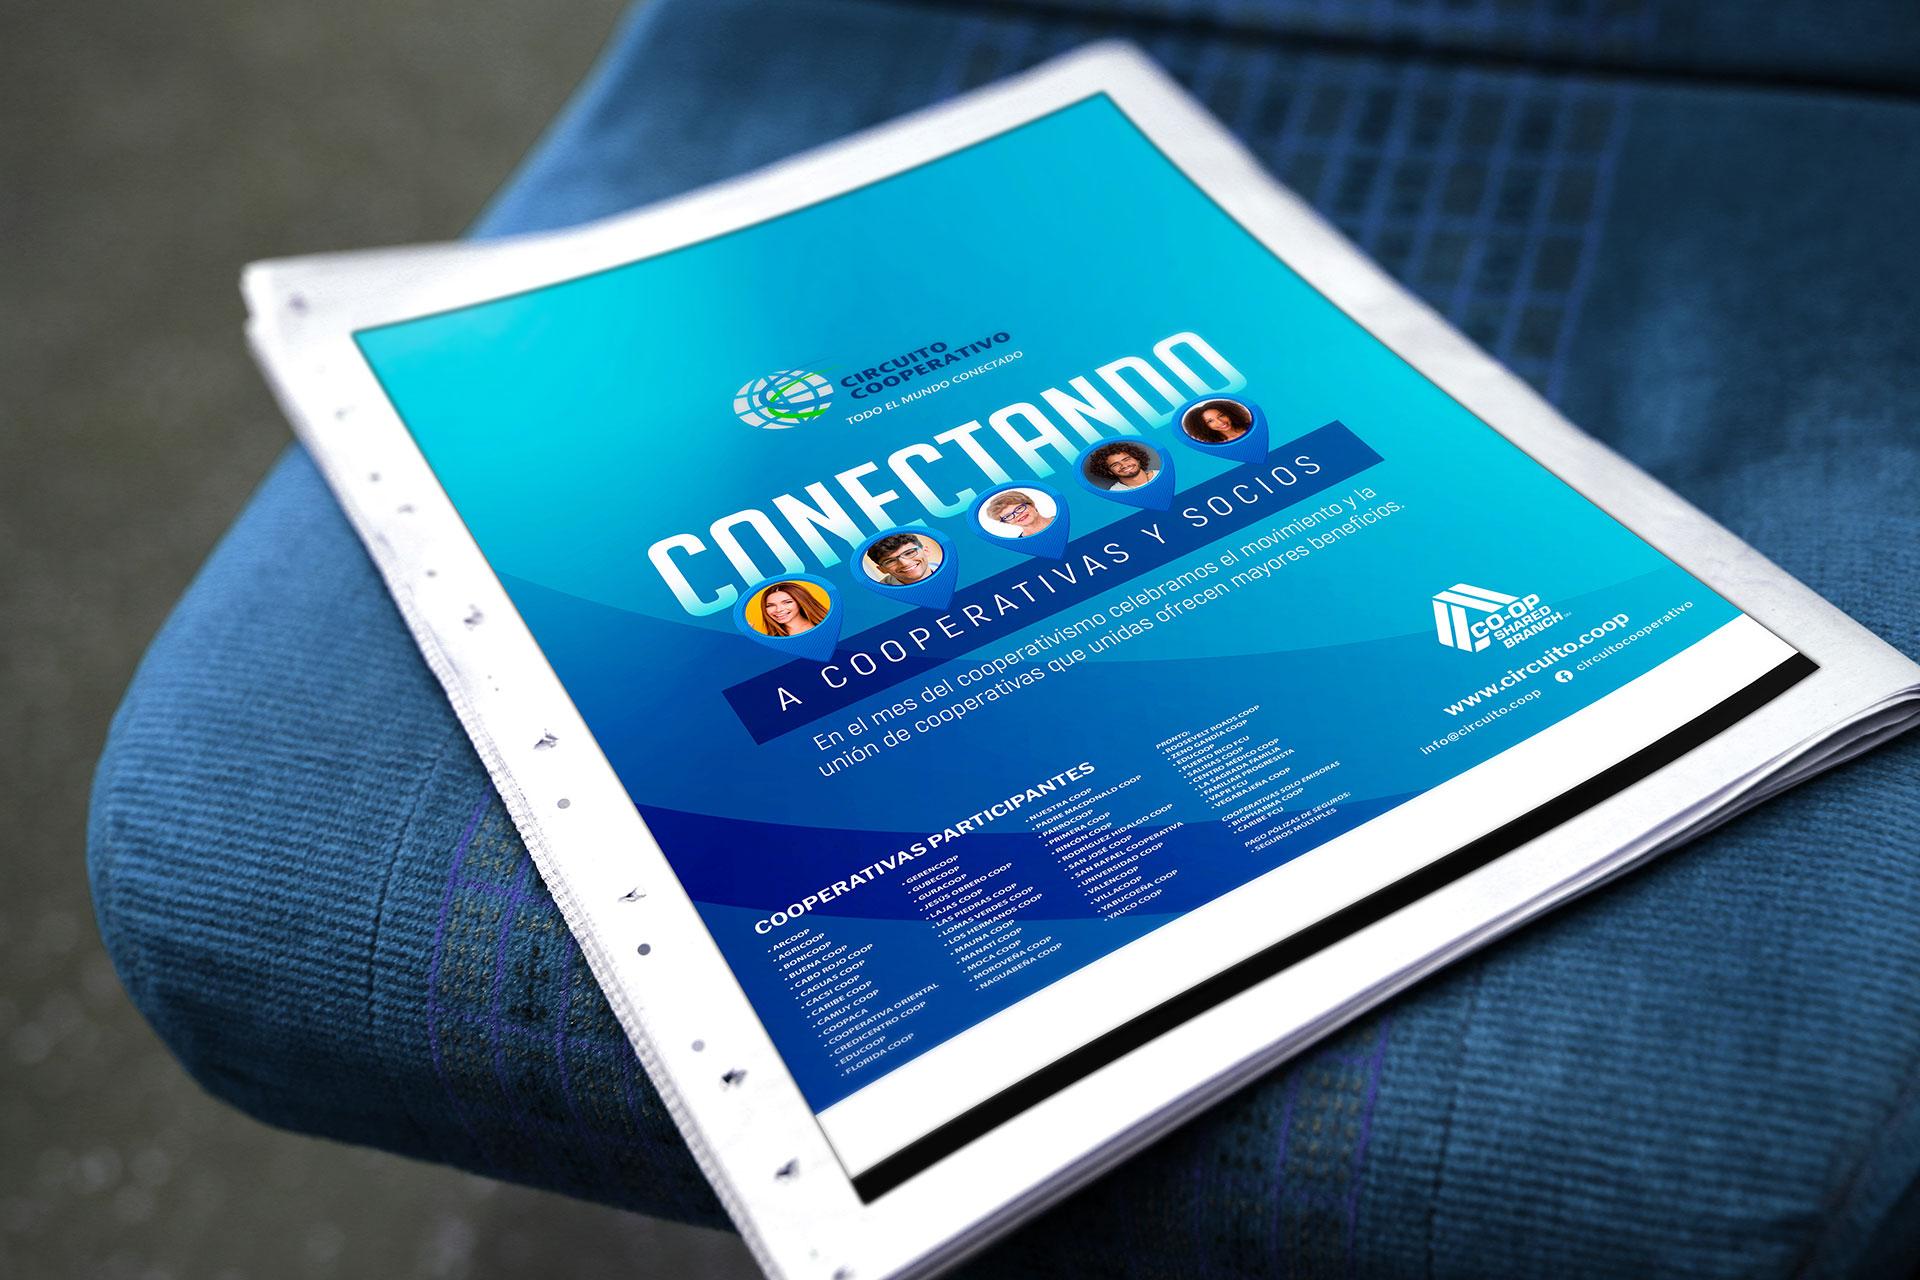 BM_WORK_CIRCUITO_CONECTA_3